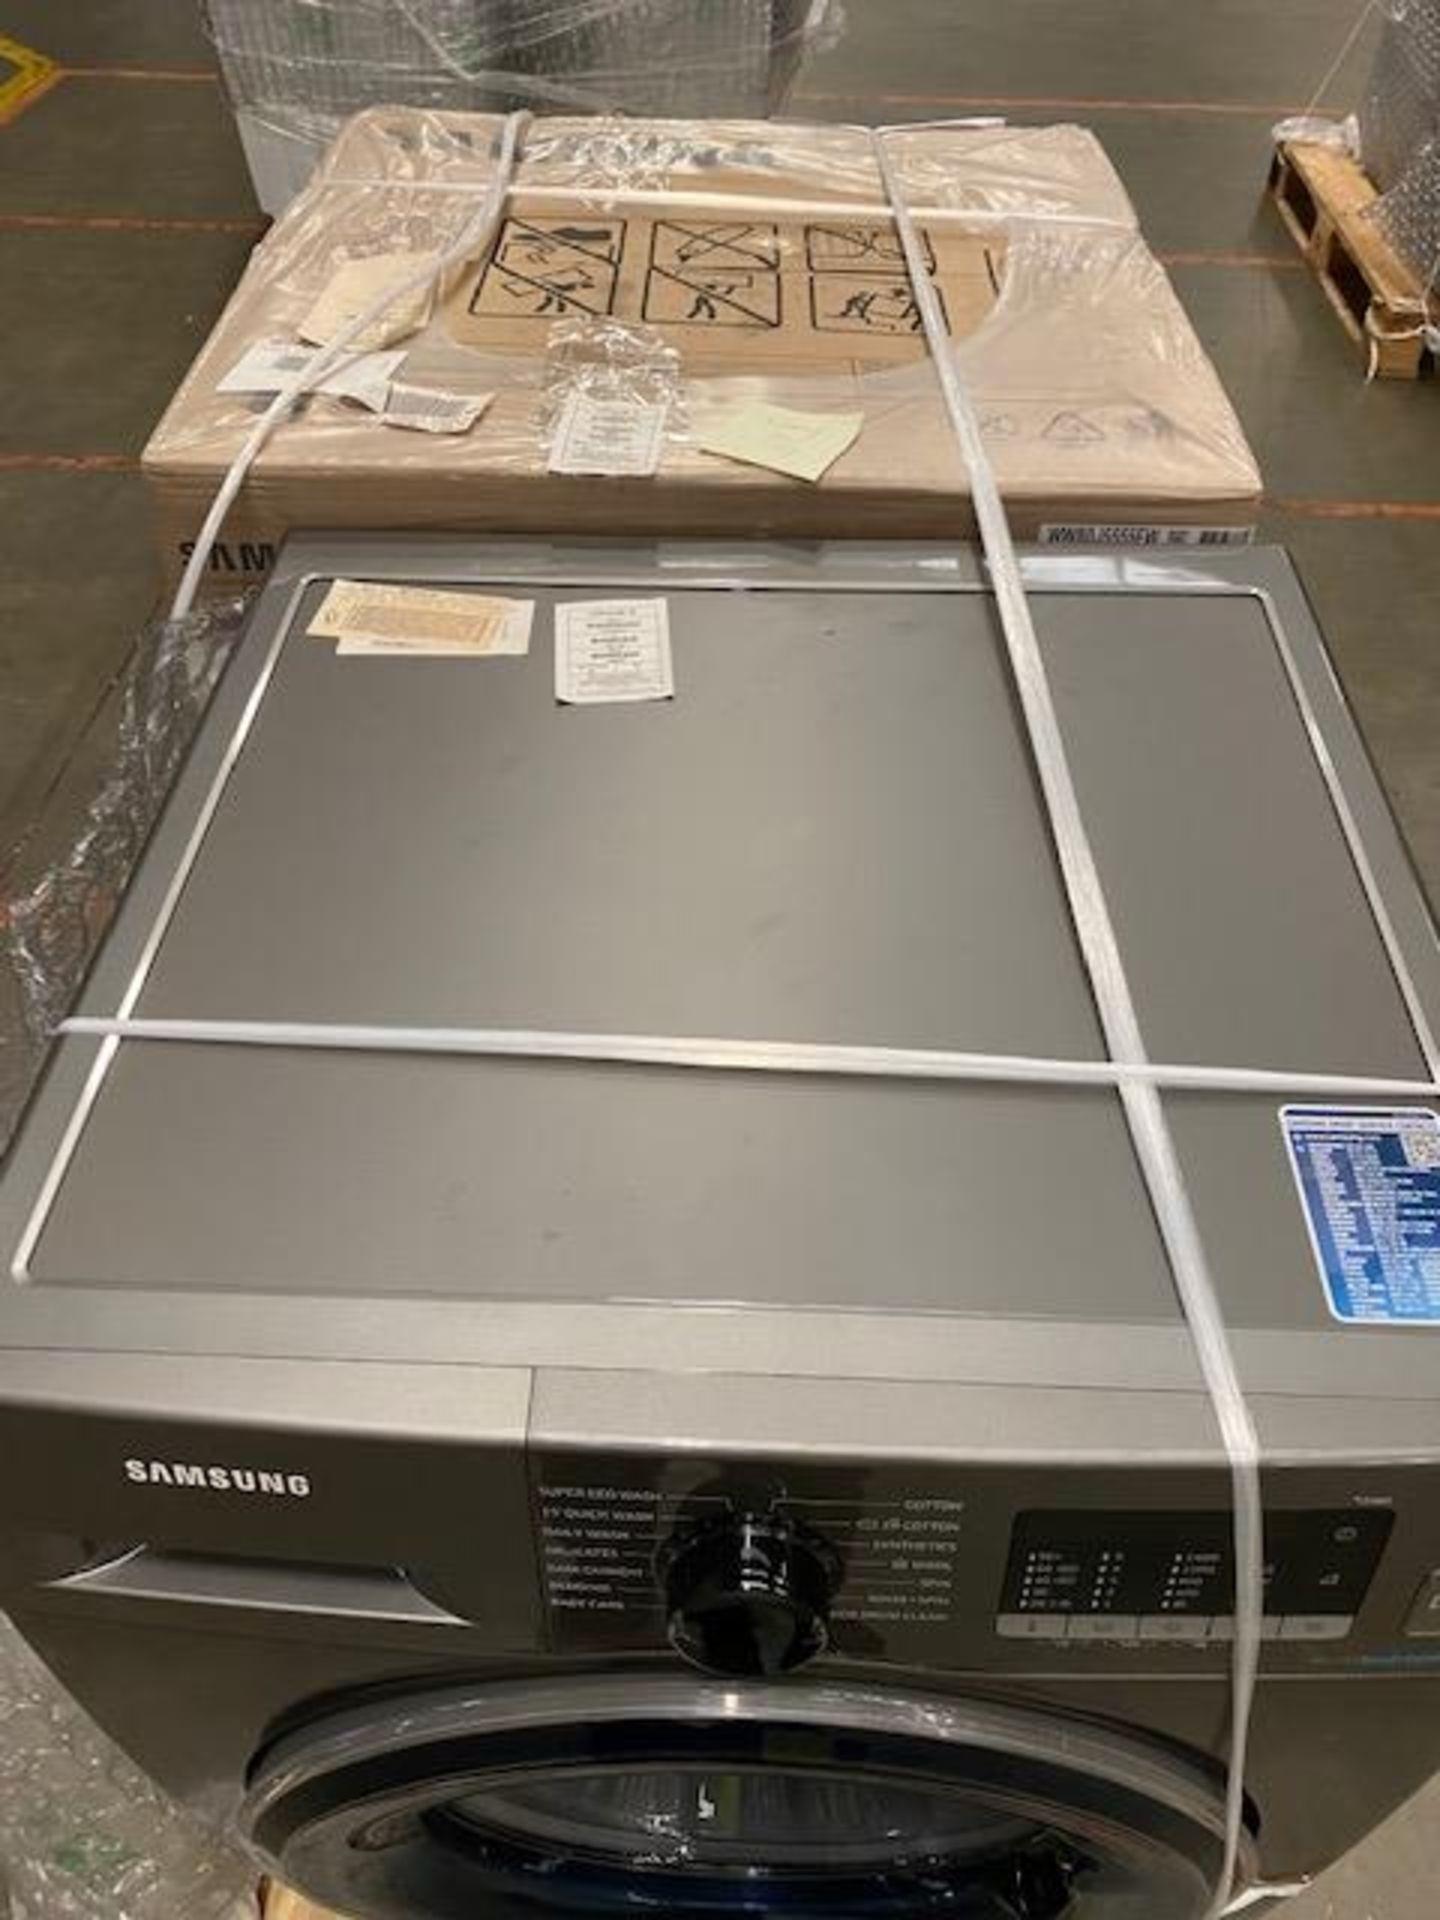 Pallet of 2 Samsung Premium Washing machines. Total Latest selling price £678* - Image 5 of 9